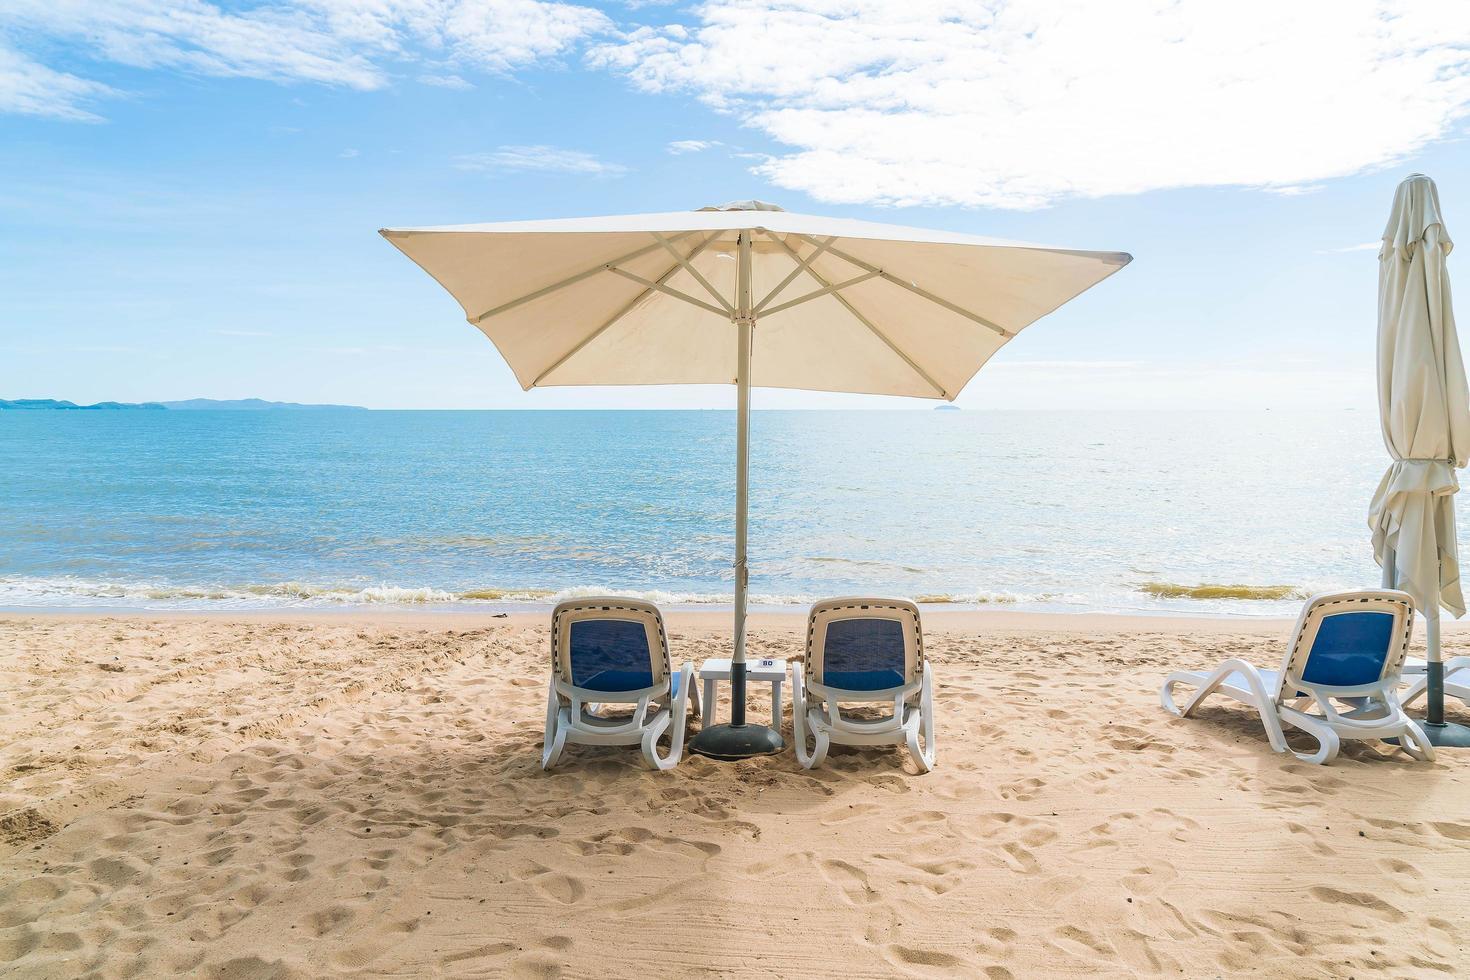 Solo Regenschirm am Strand foto